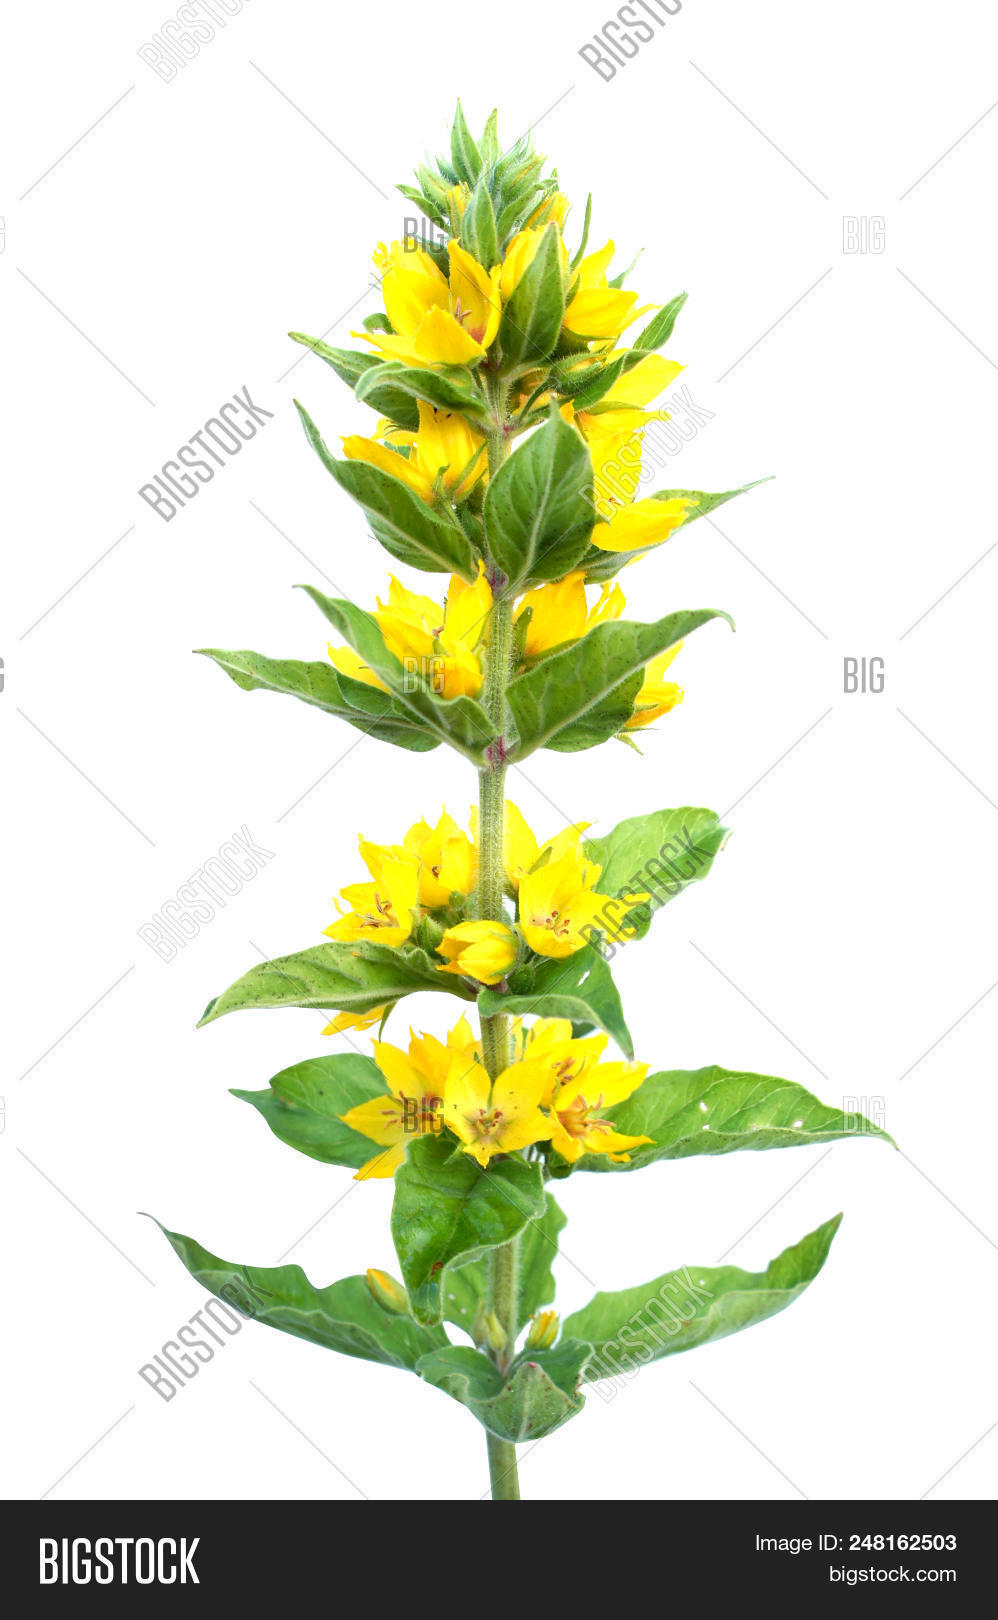 Yellow loosestrife image photo free trial bigstock yellow loosestrife flower isolated on a white background lysimachia mightylinksfo